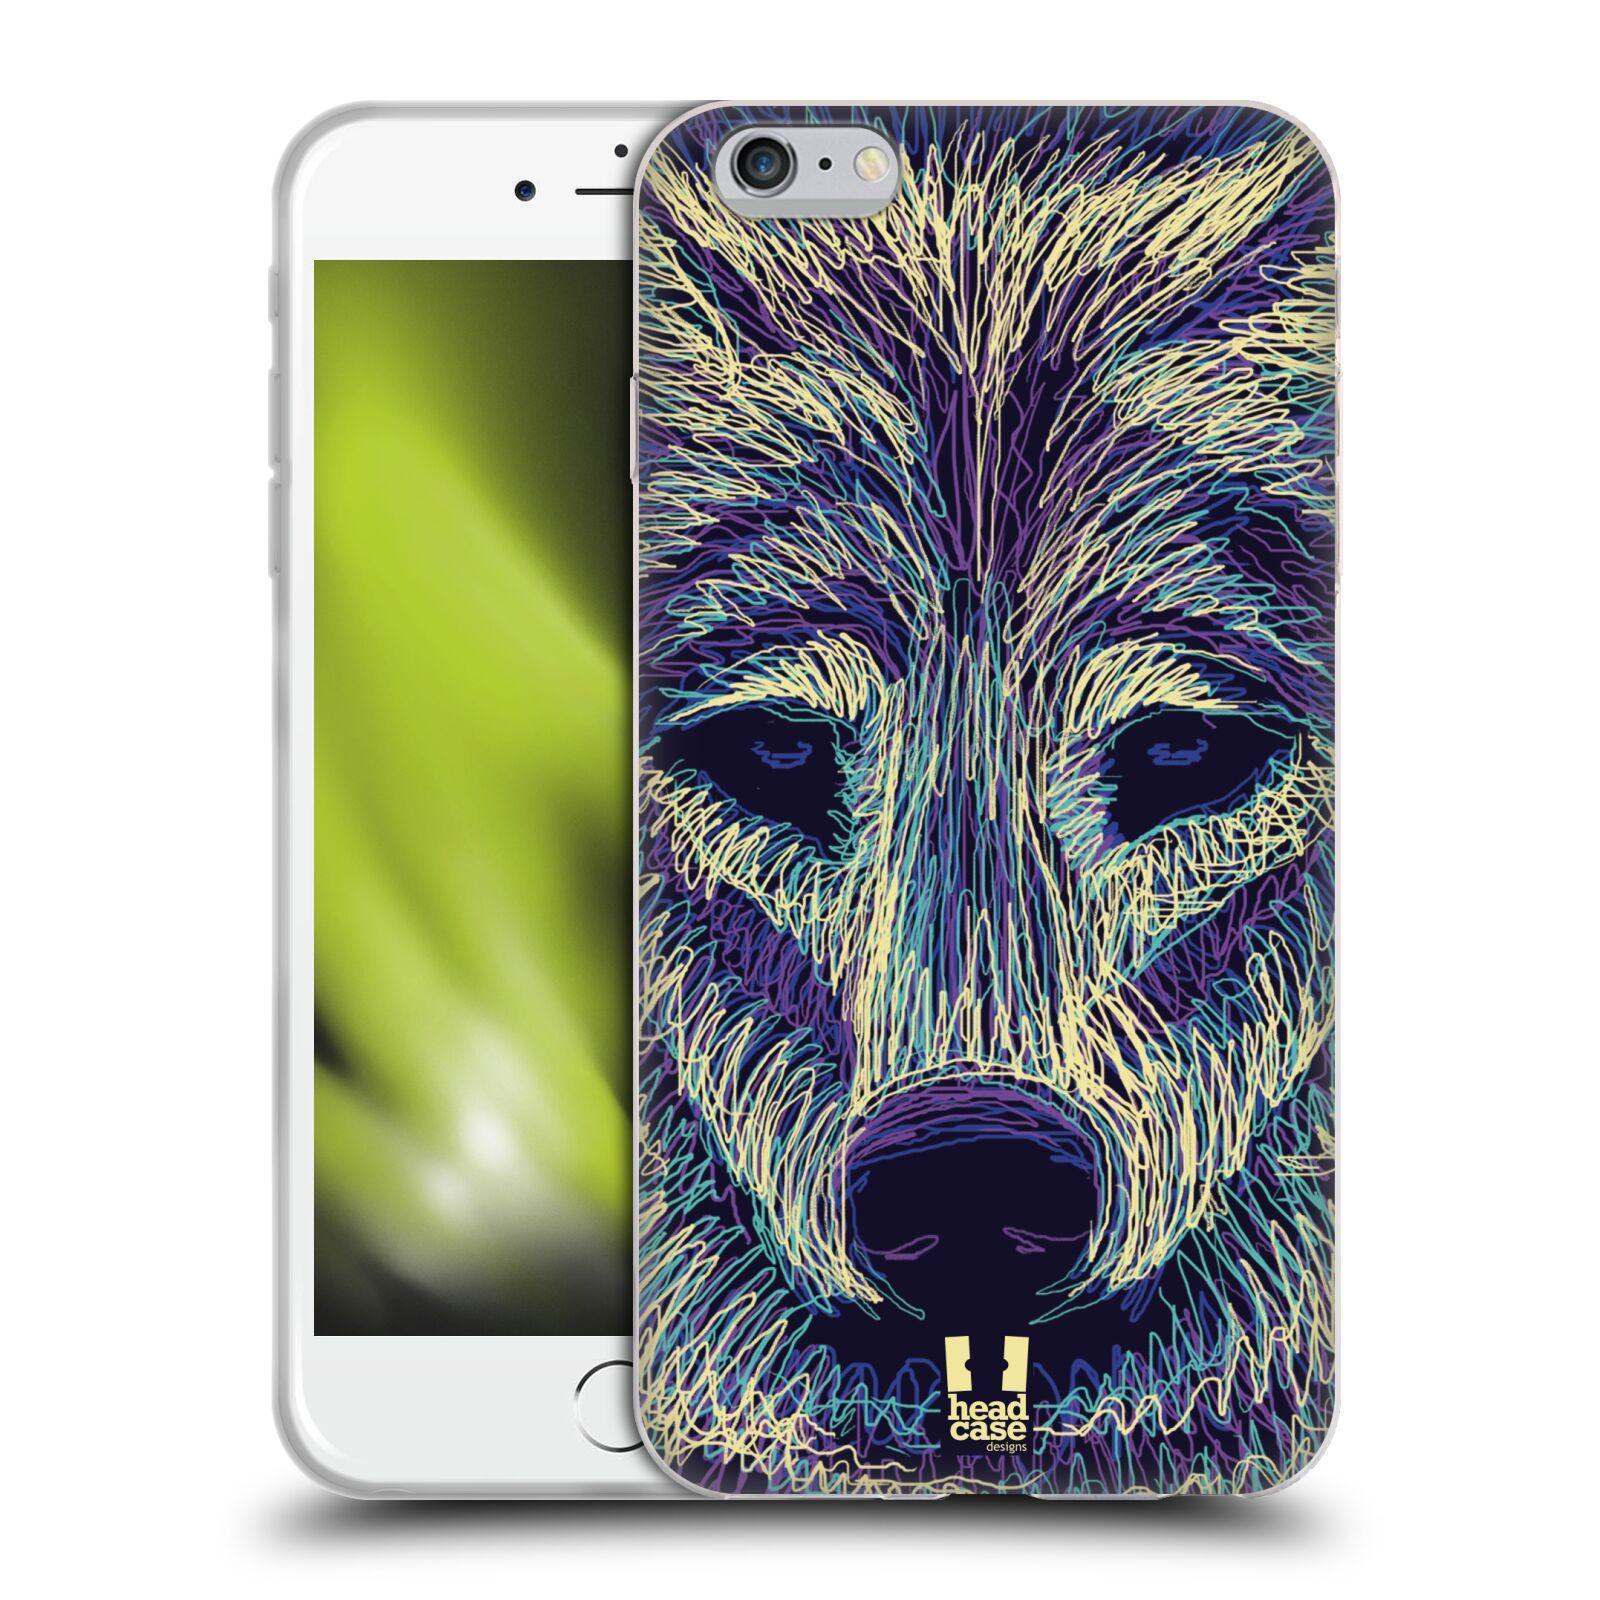 HEAD CASE silikonový obal na mobil Apple Iphone 6 PLUS/ 6S PLUS vzor zvíře čmáranice vlk